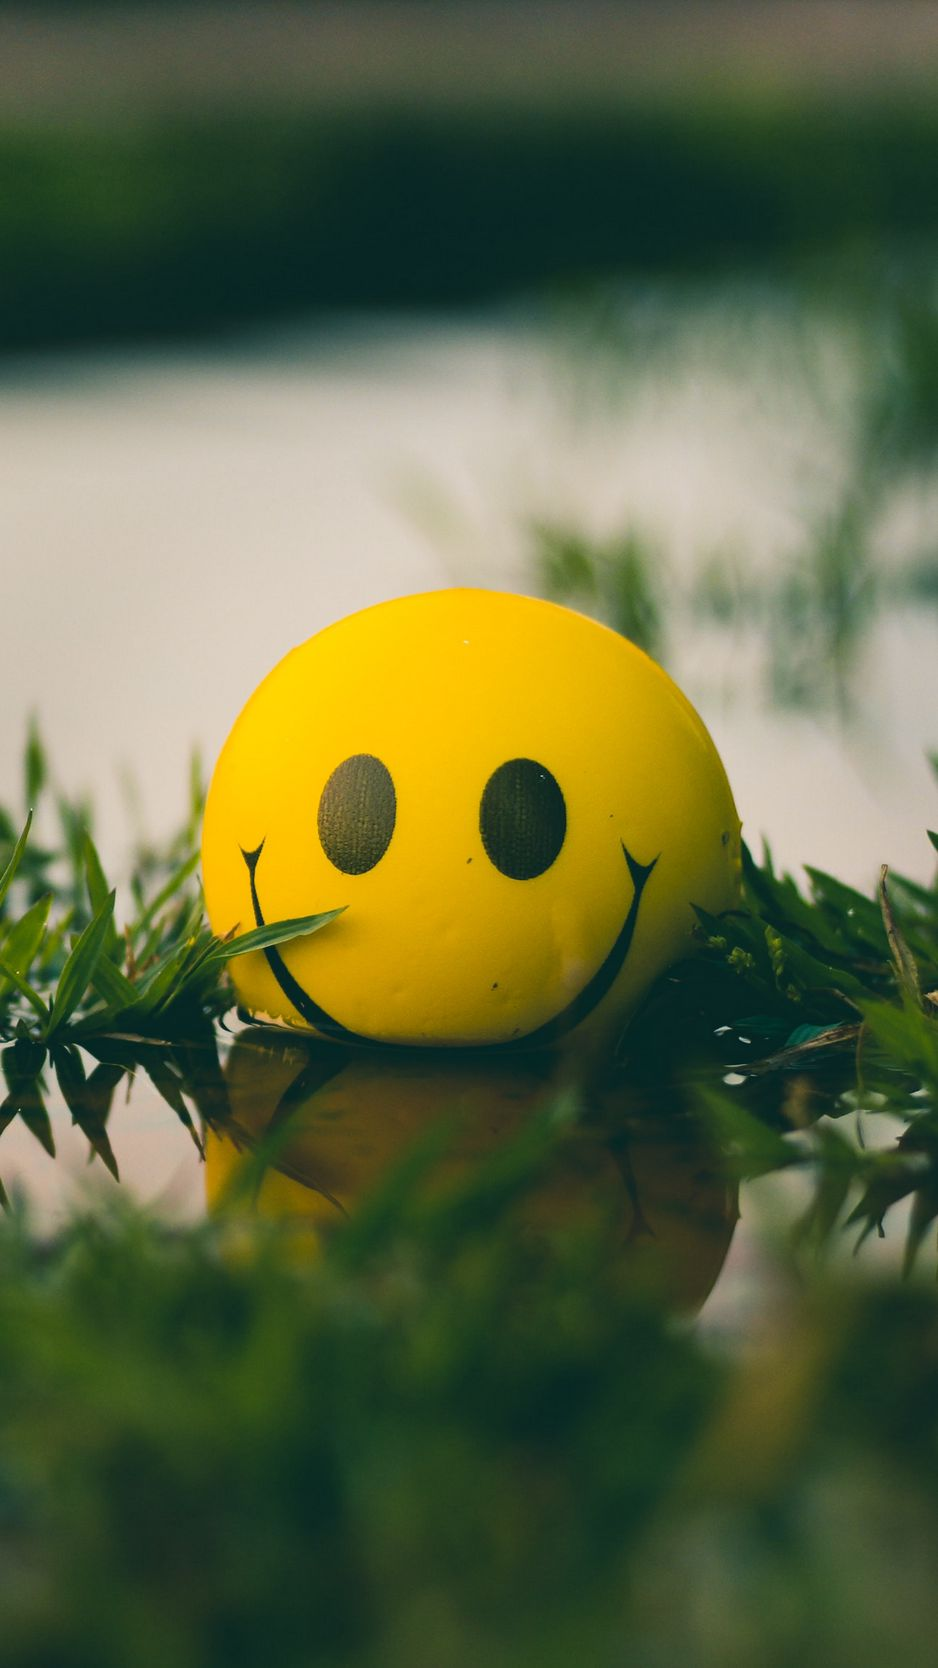 938x1668 Wallpaper ball, smile, smiley, grass, water